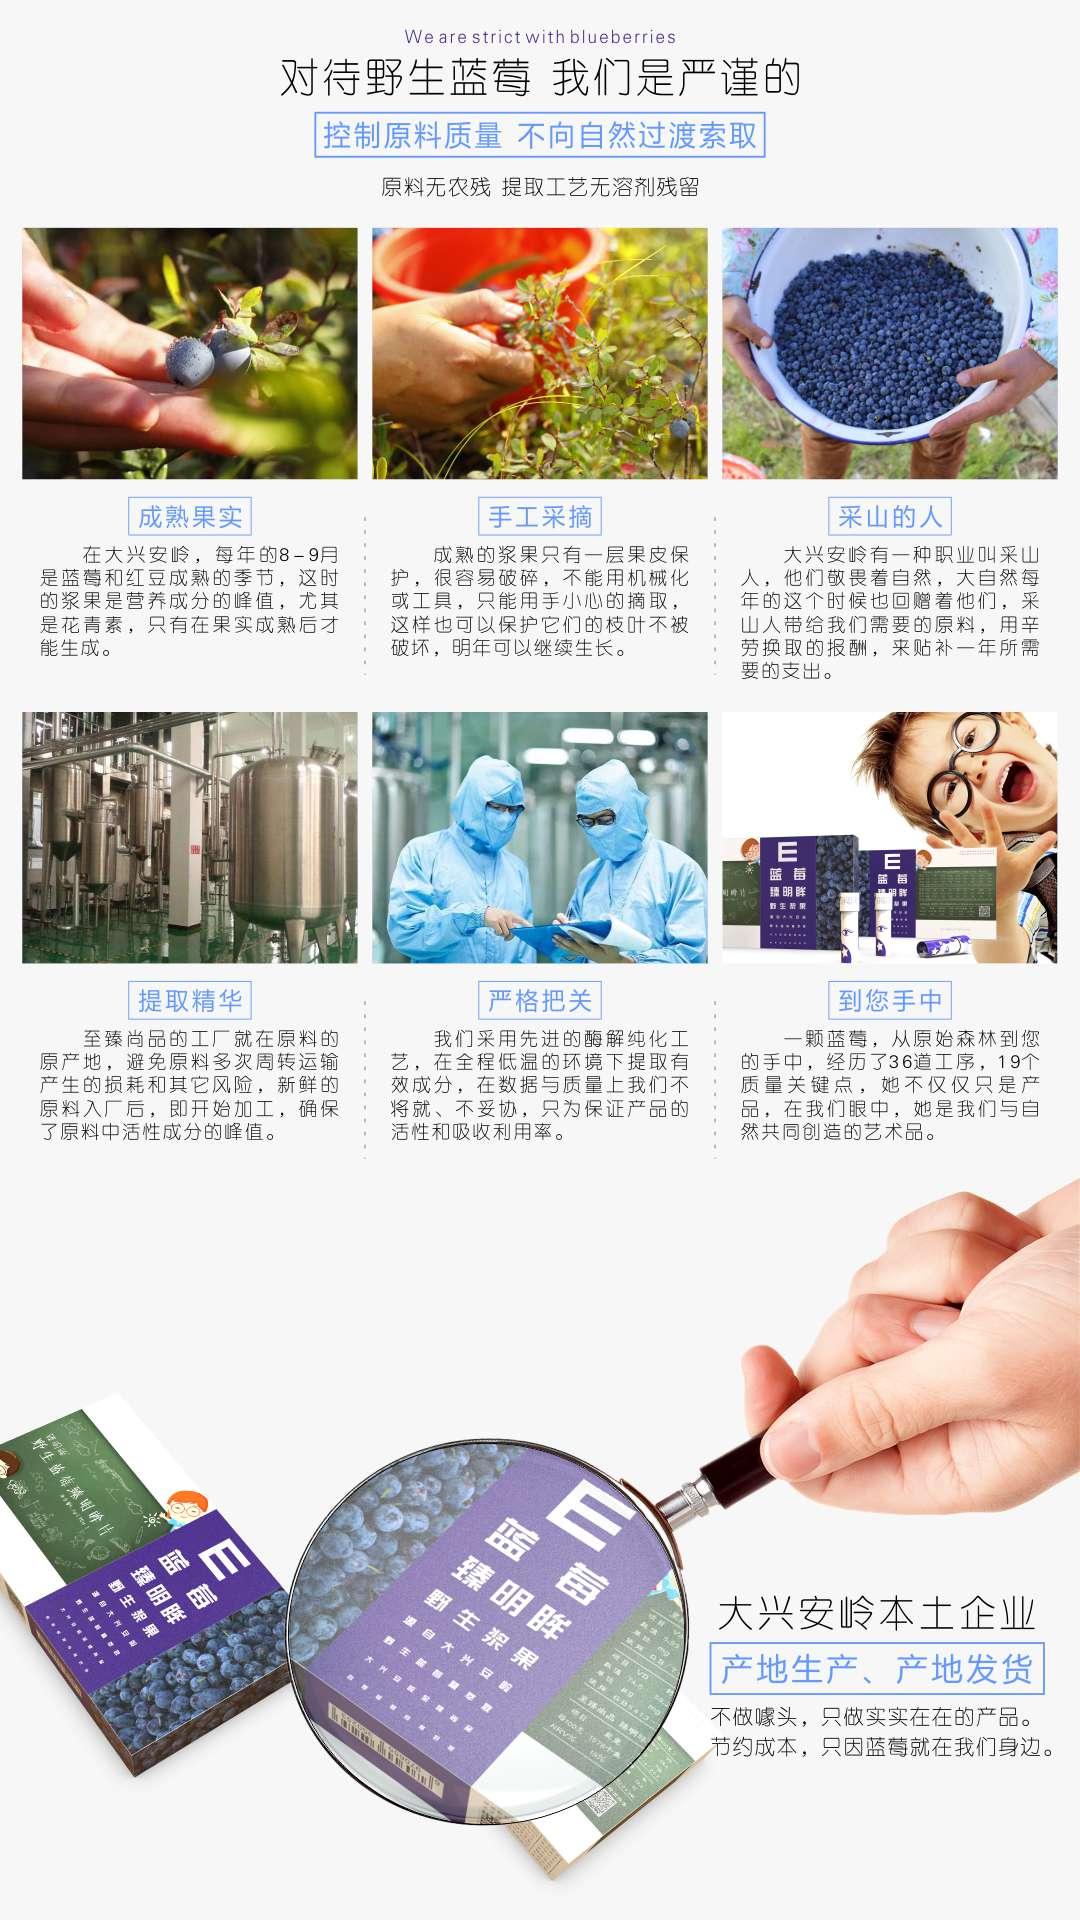 Z 至臻尚品-臻明眸藍莓花青素片-05.jpg